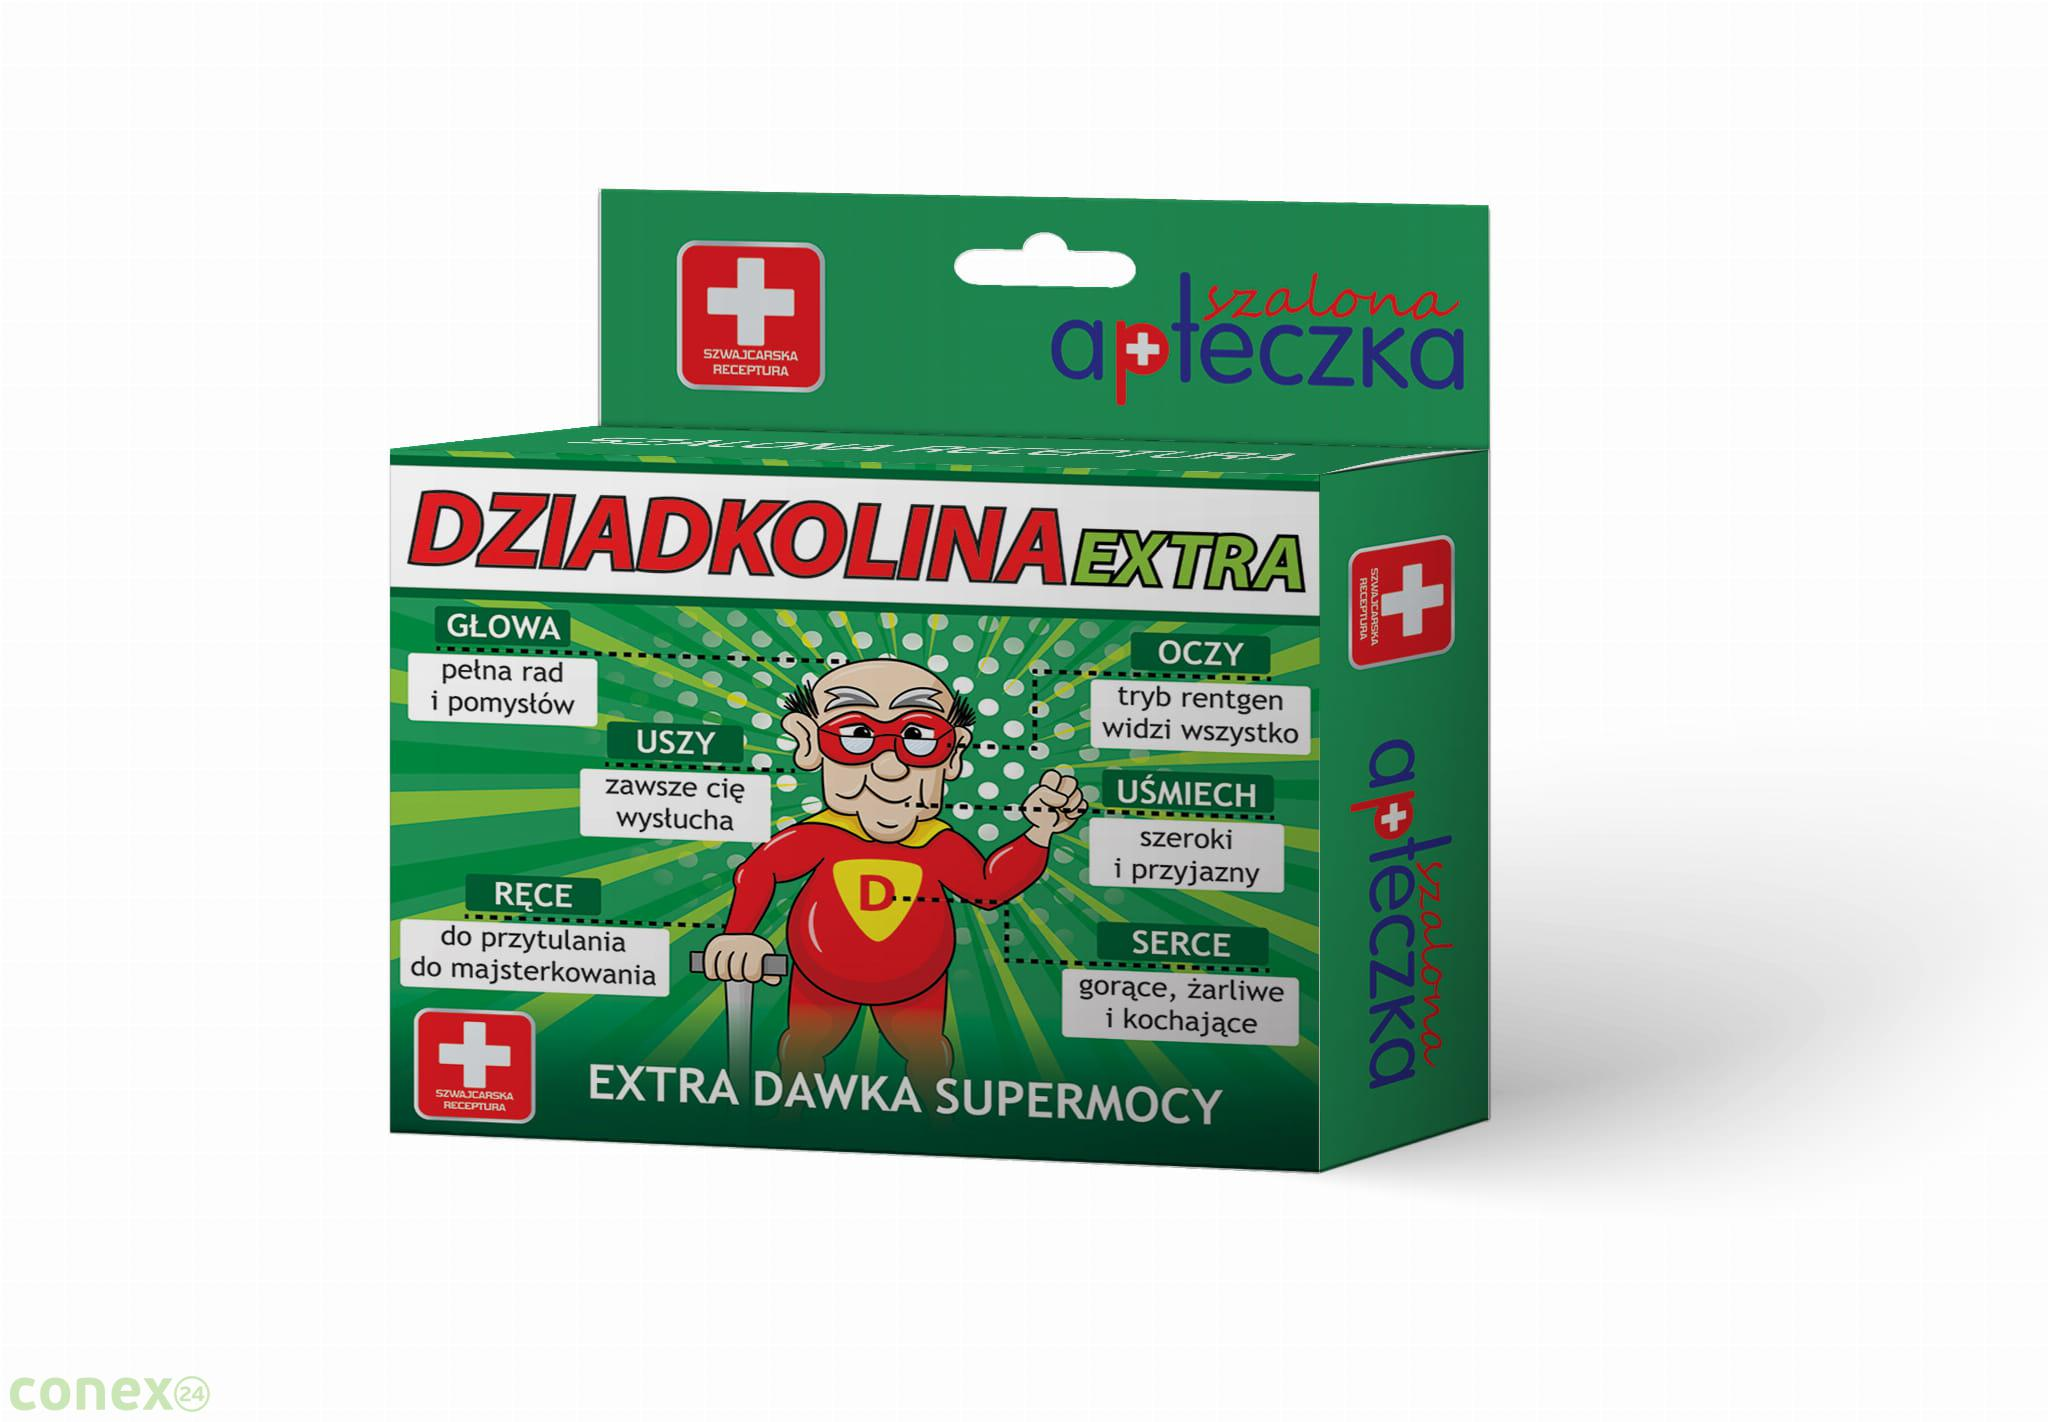 Tabletki - Dziadkolina EXTRA